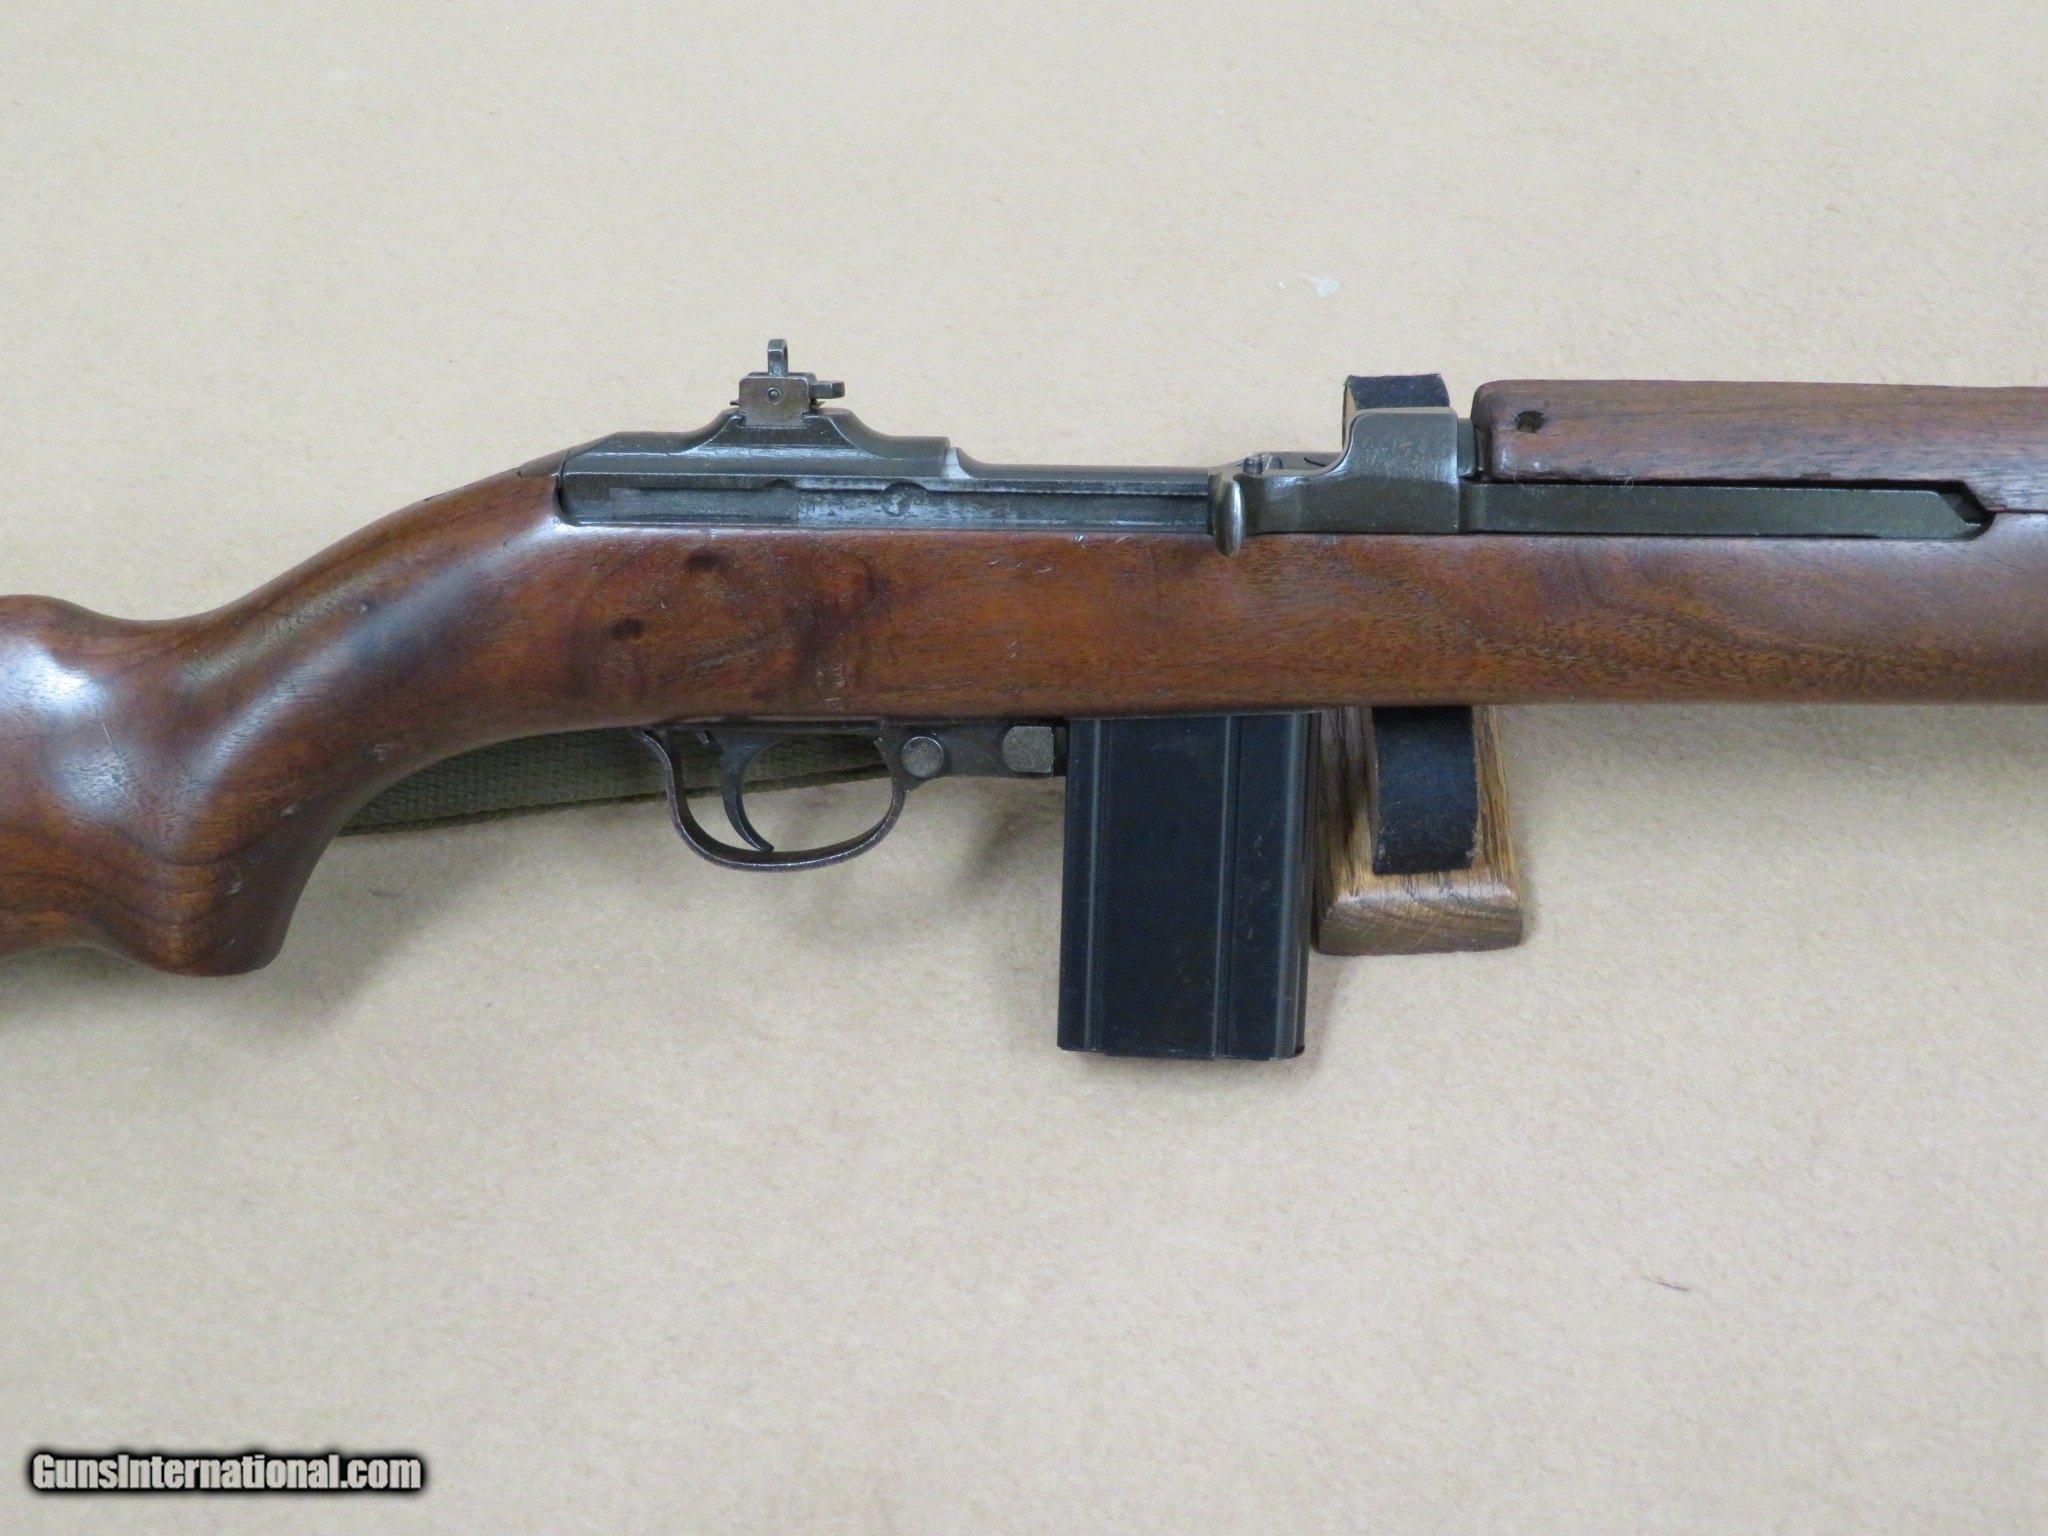 WW2 Standard Products M1 Carbine (1st production block